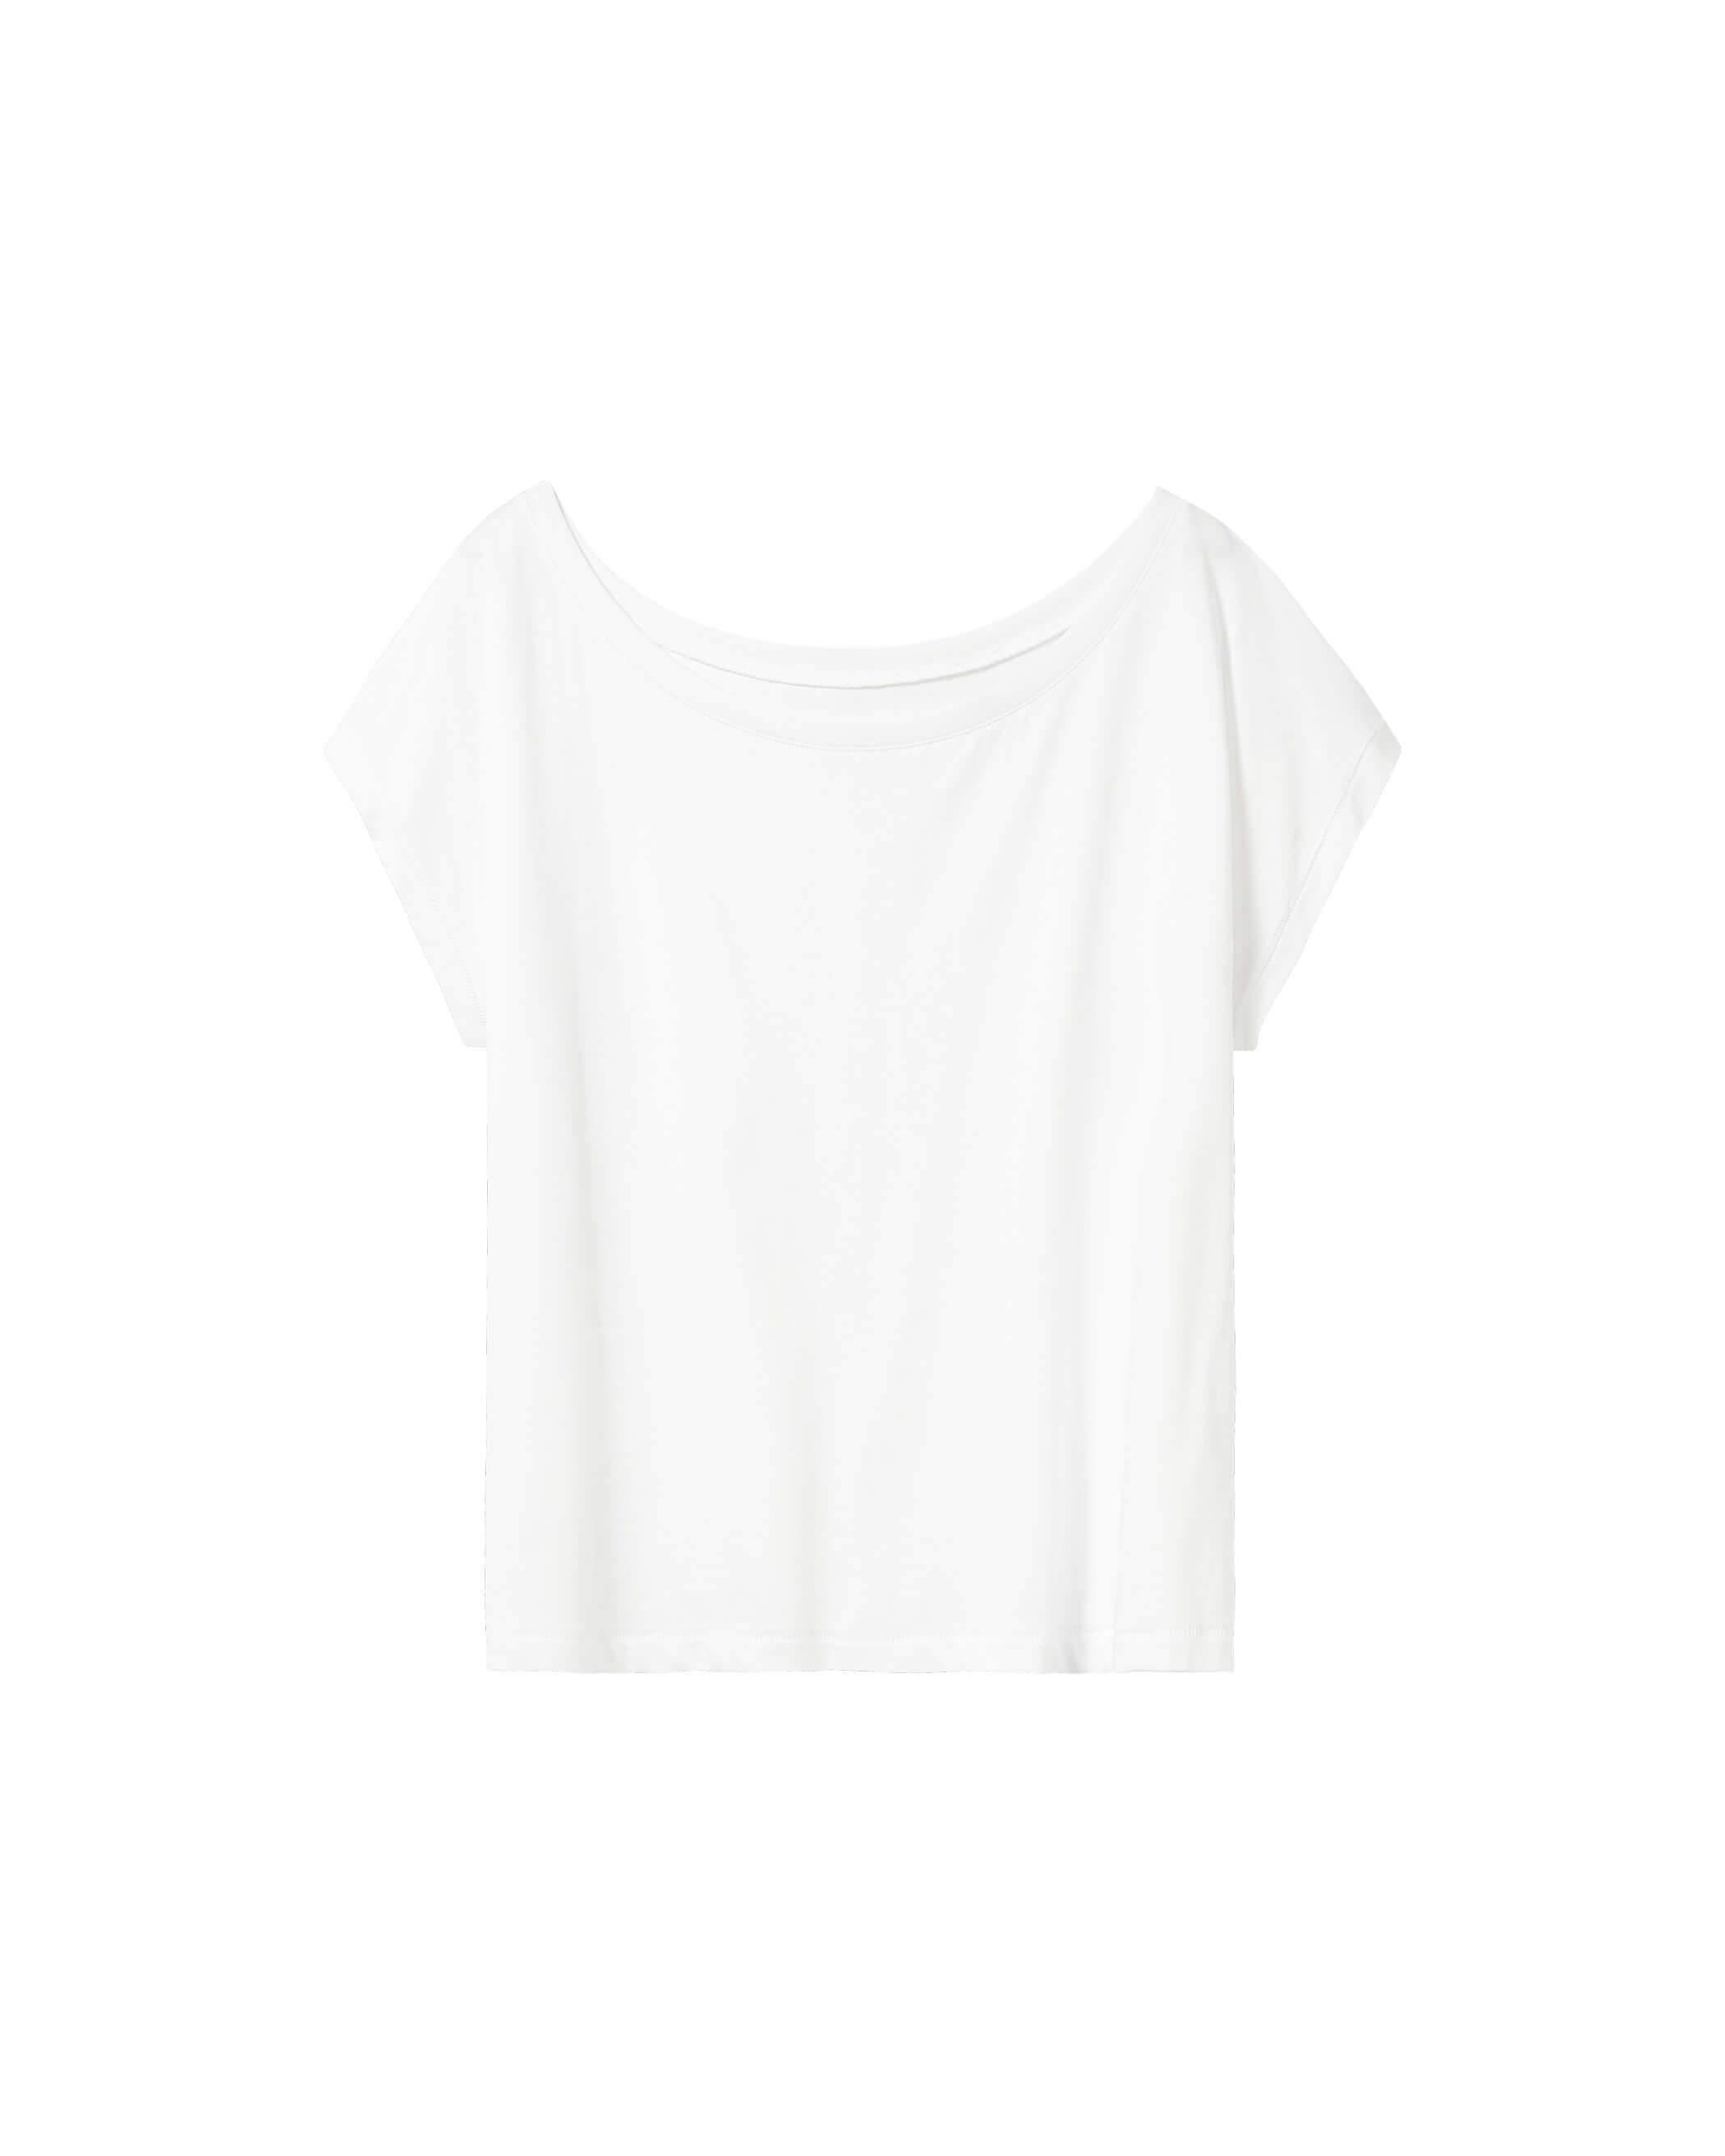 Bella Cropped Top White